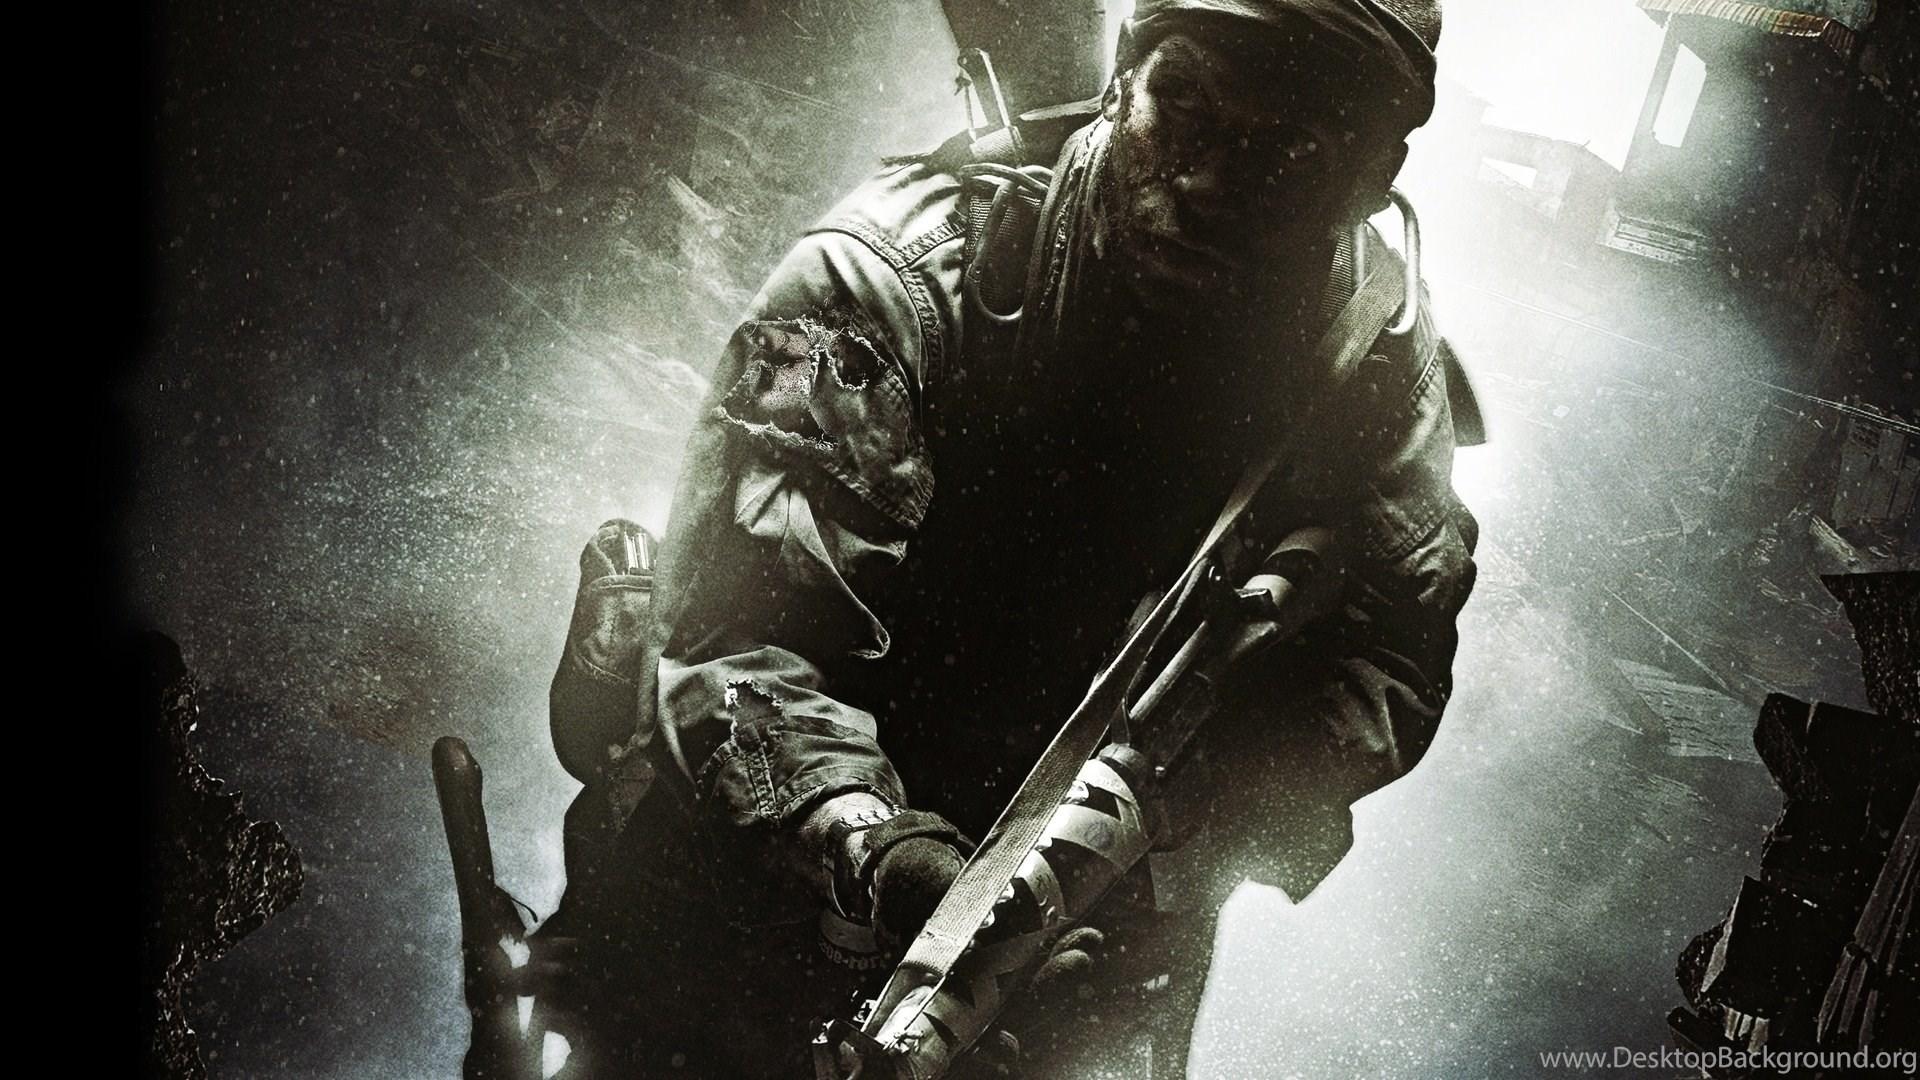 Call Of Duty Black Ops 2 Wallpapers 1920x1080 1458474 Desktop